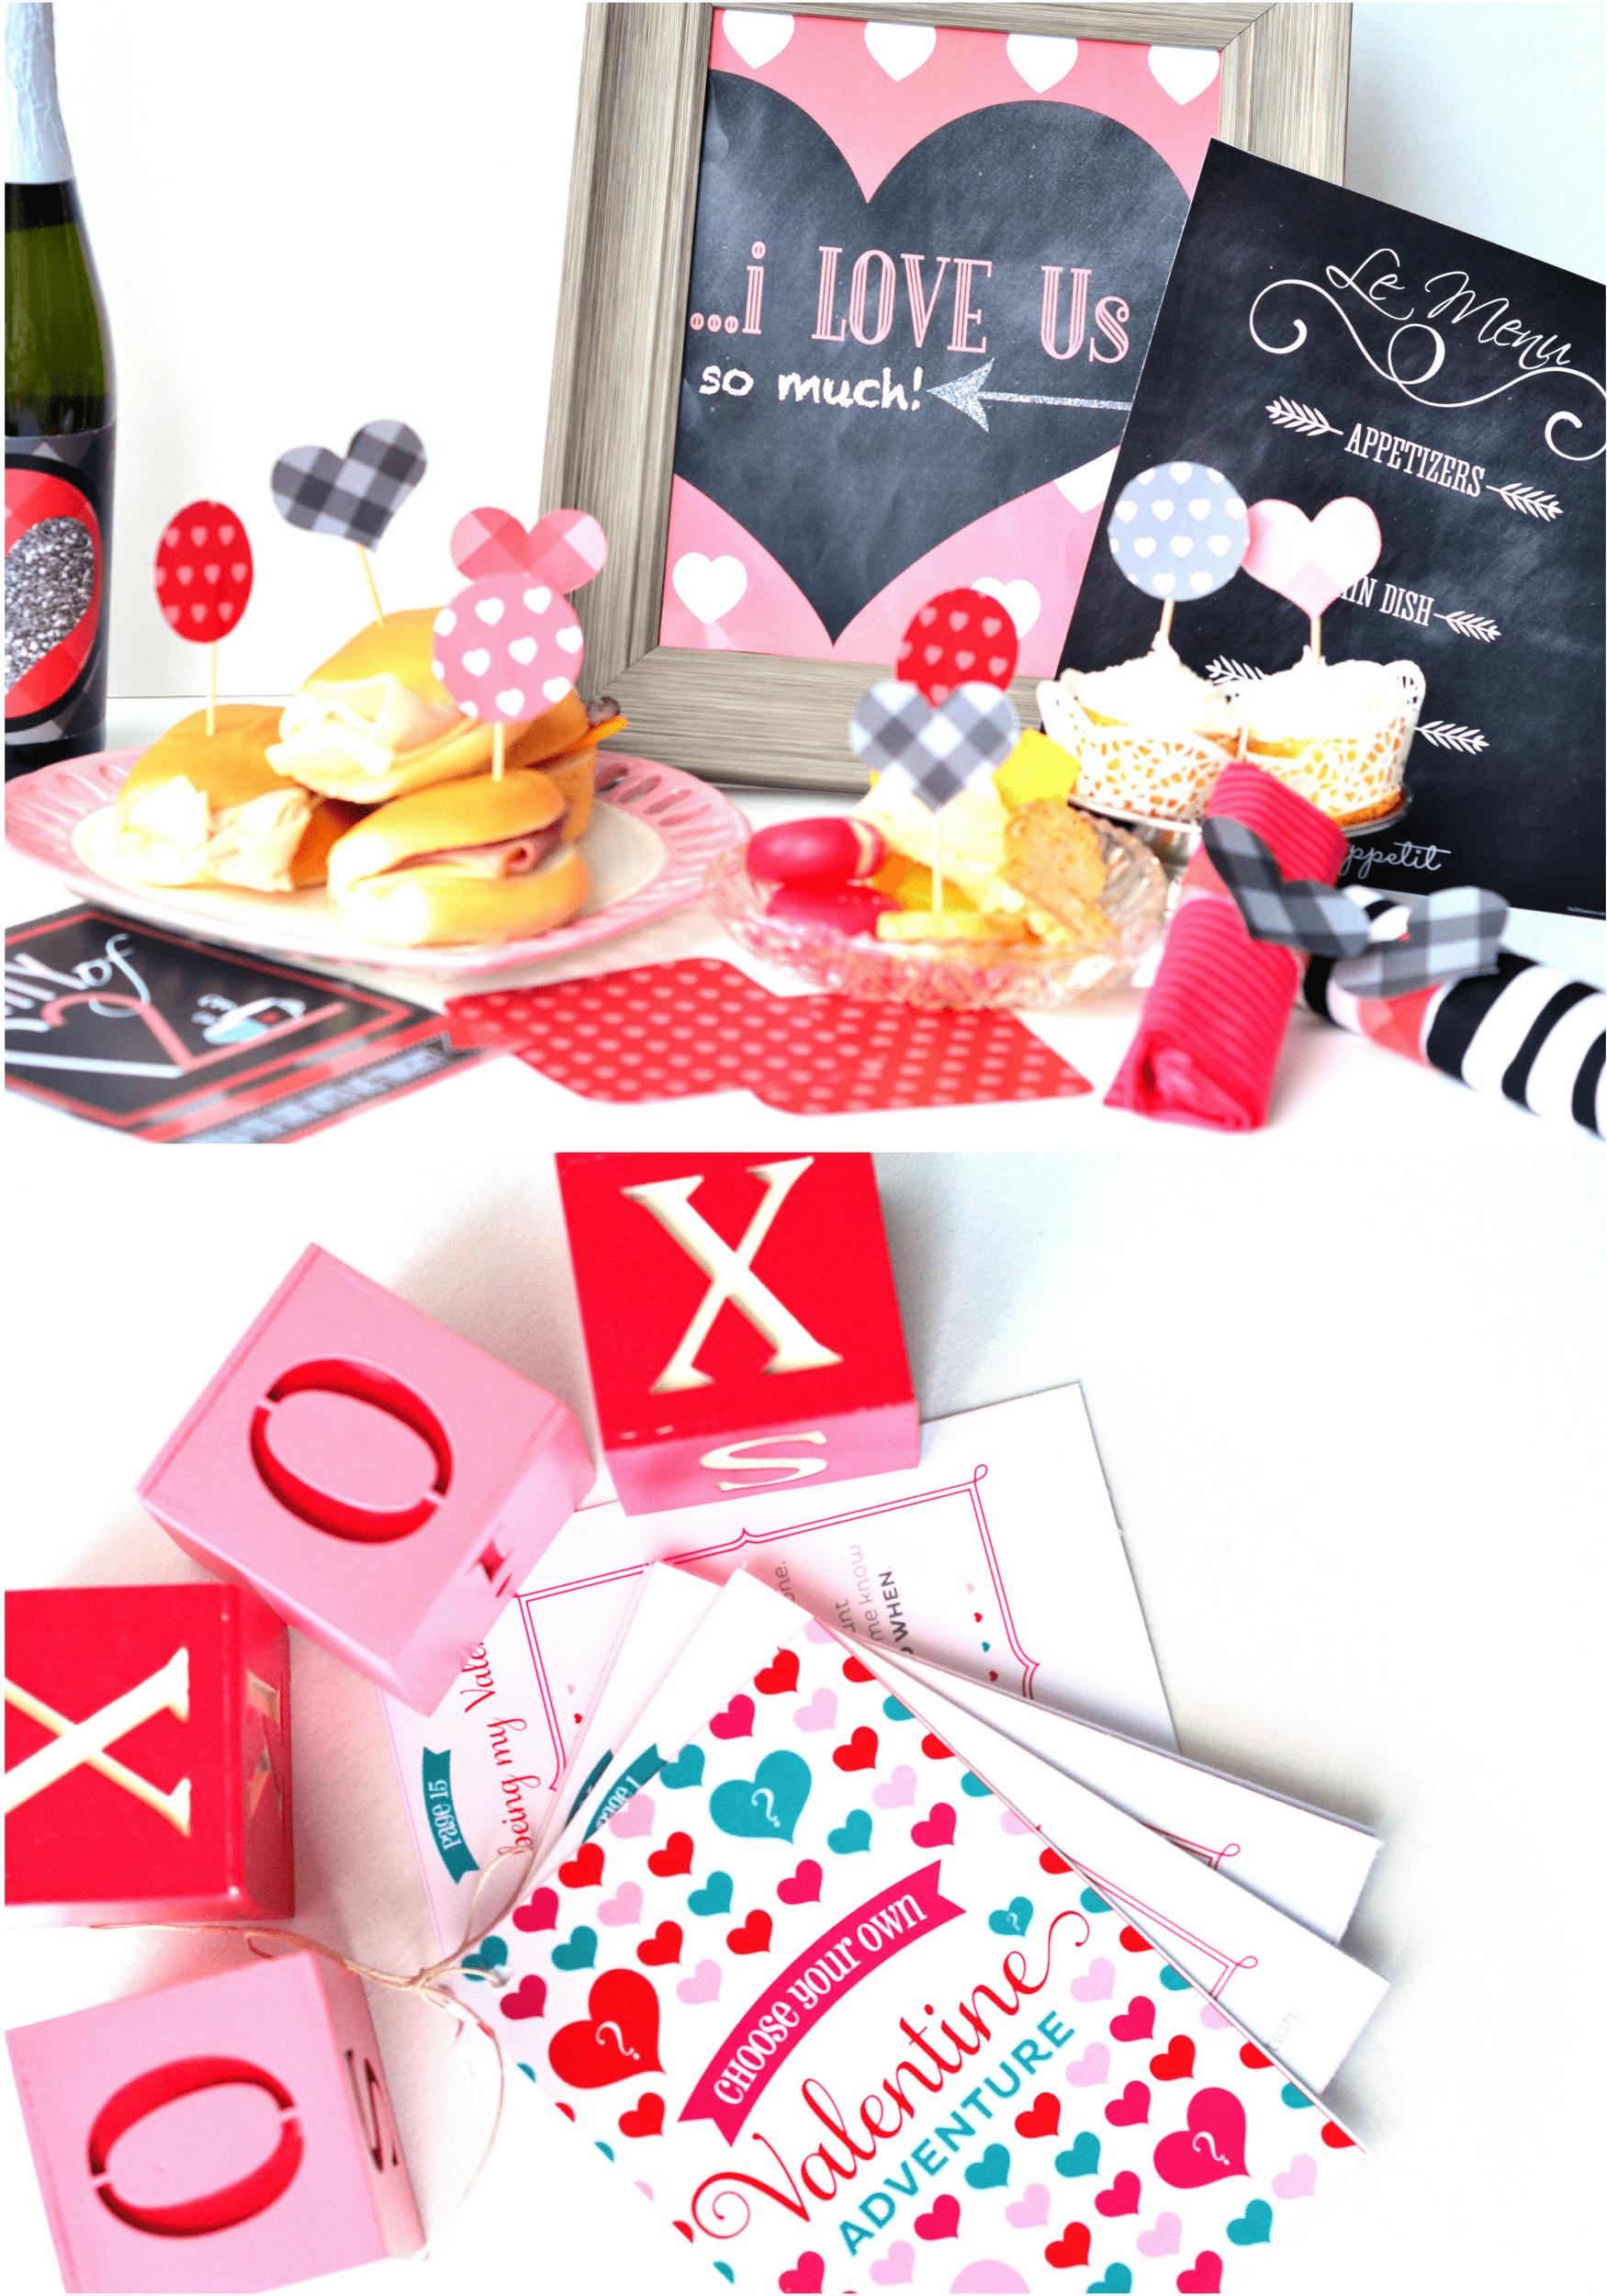 Dating valentine's day-in-Okhura